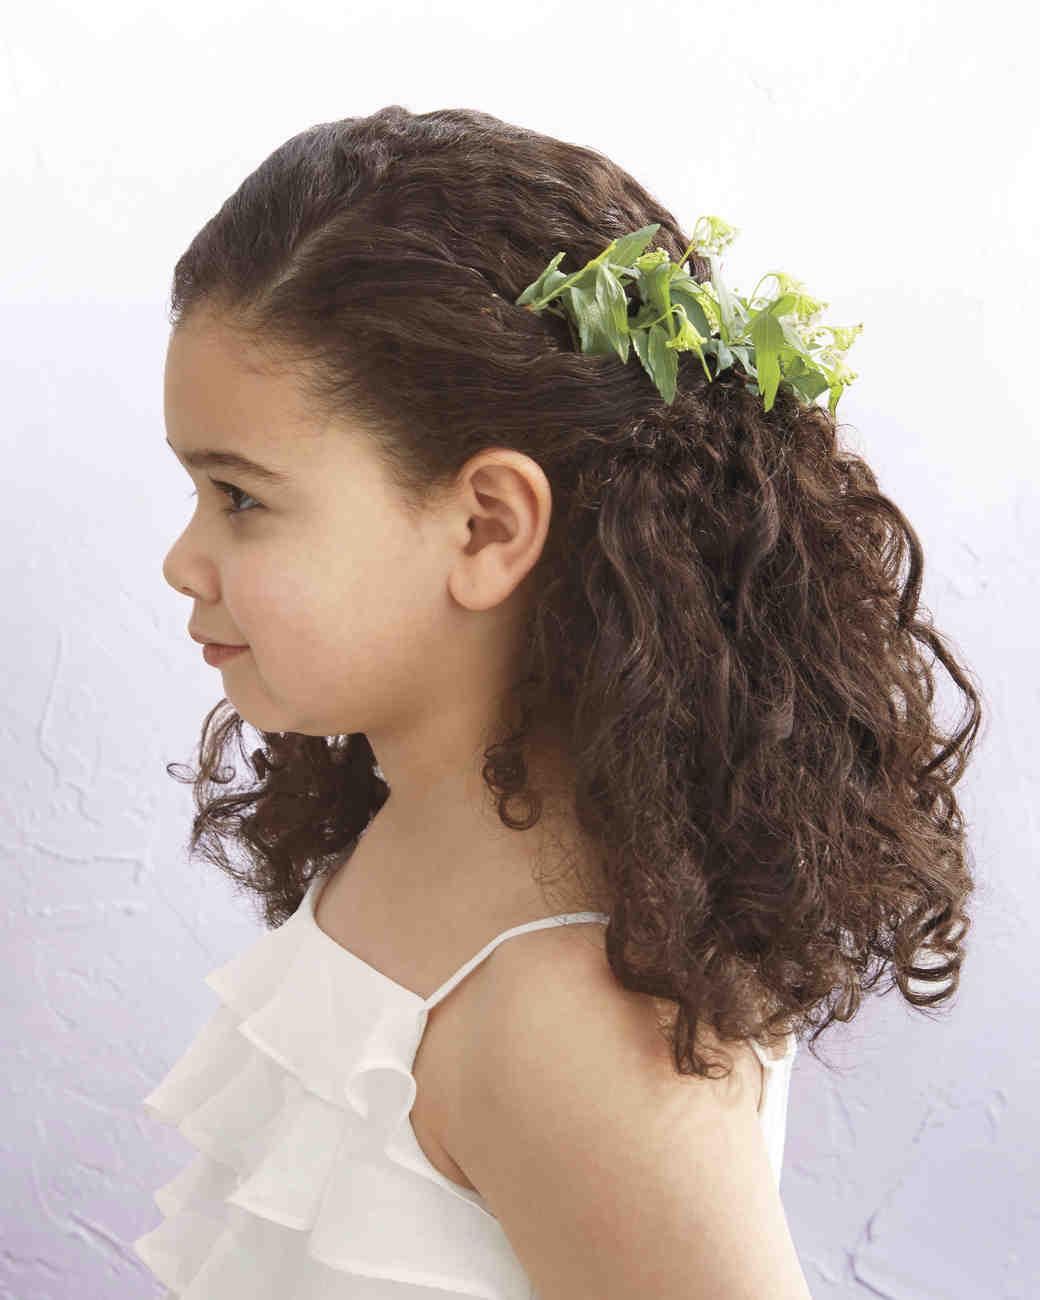 Фото девушки с цветком